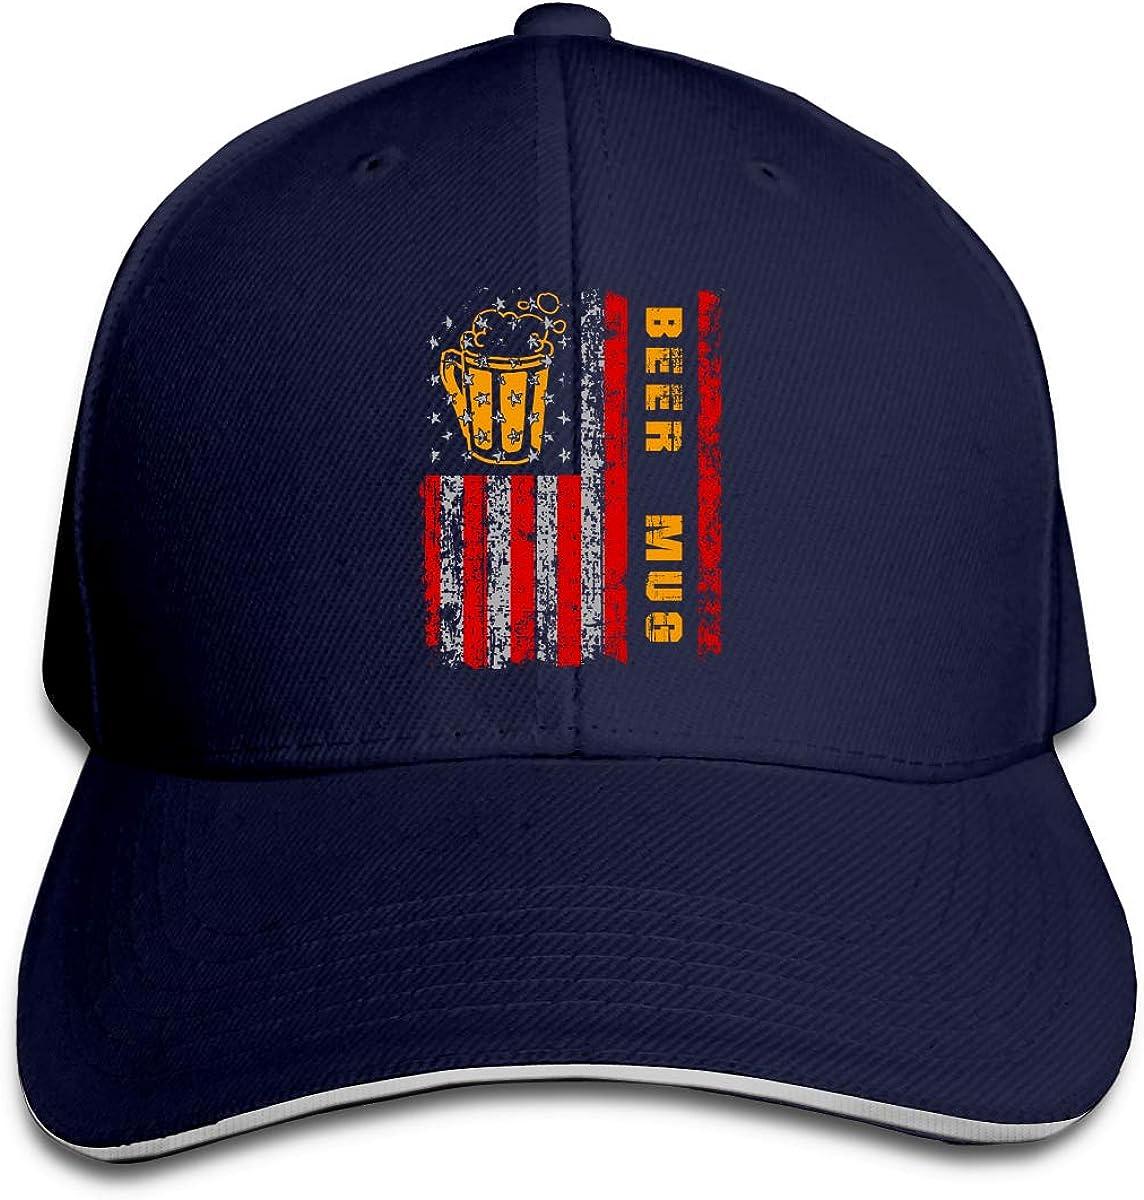 GFGS LKKG Beer Mug American Flag Unisex Hats Trucker Hats Dad Baseball Hats Driver Cap